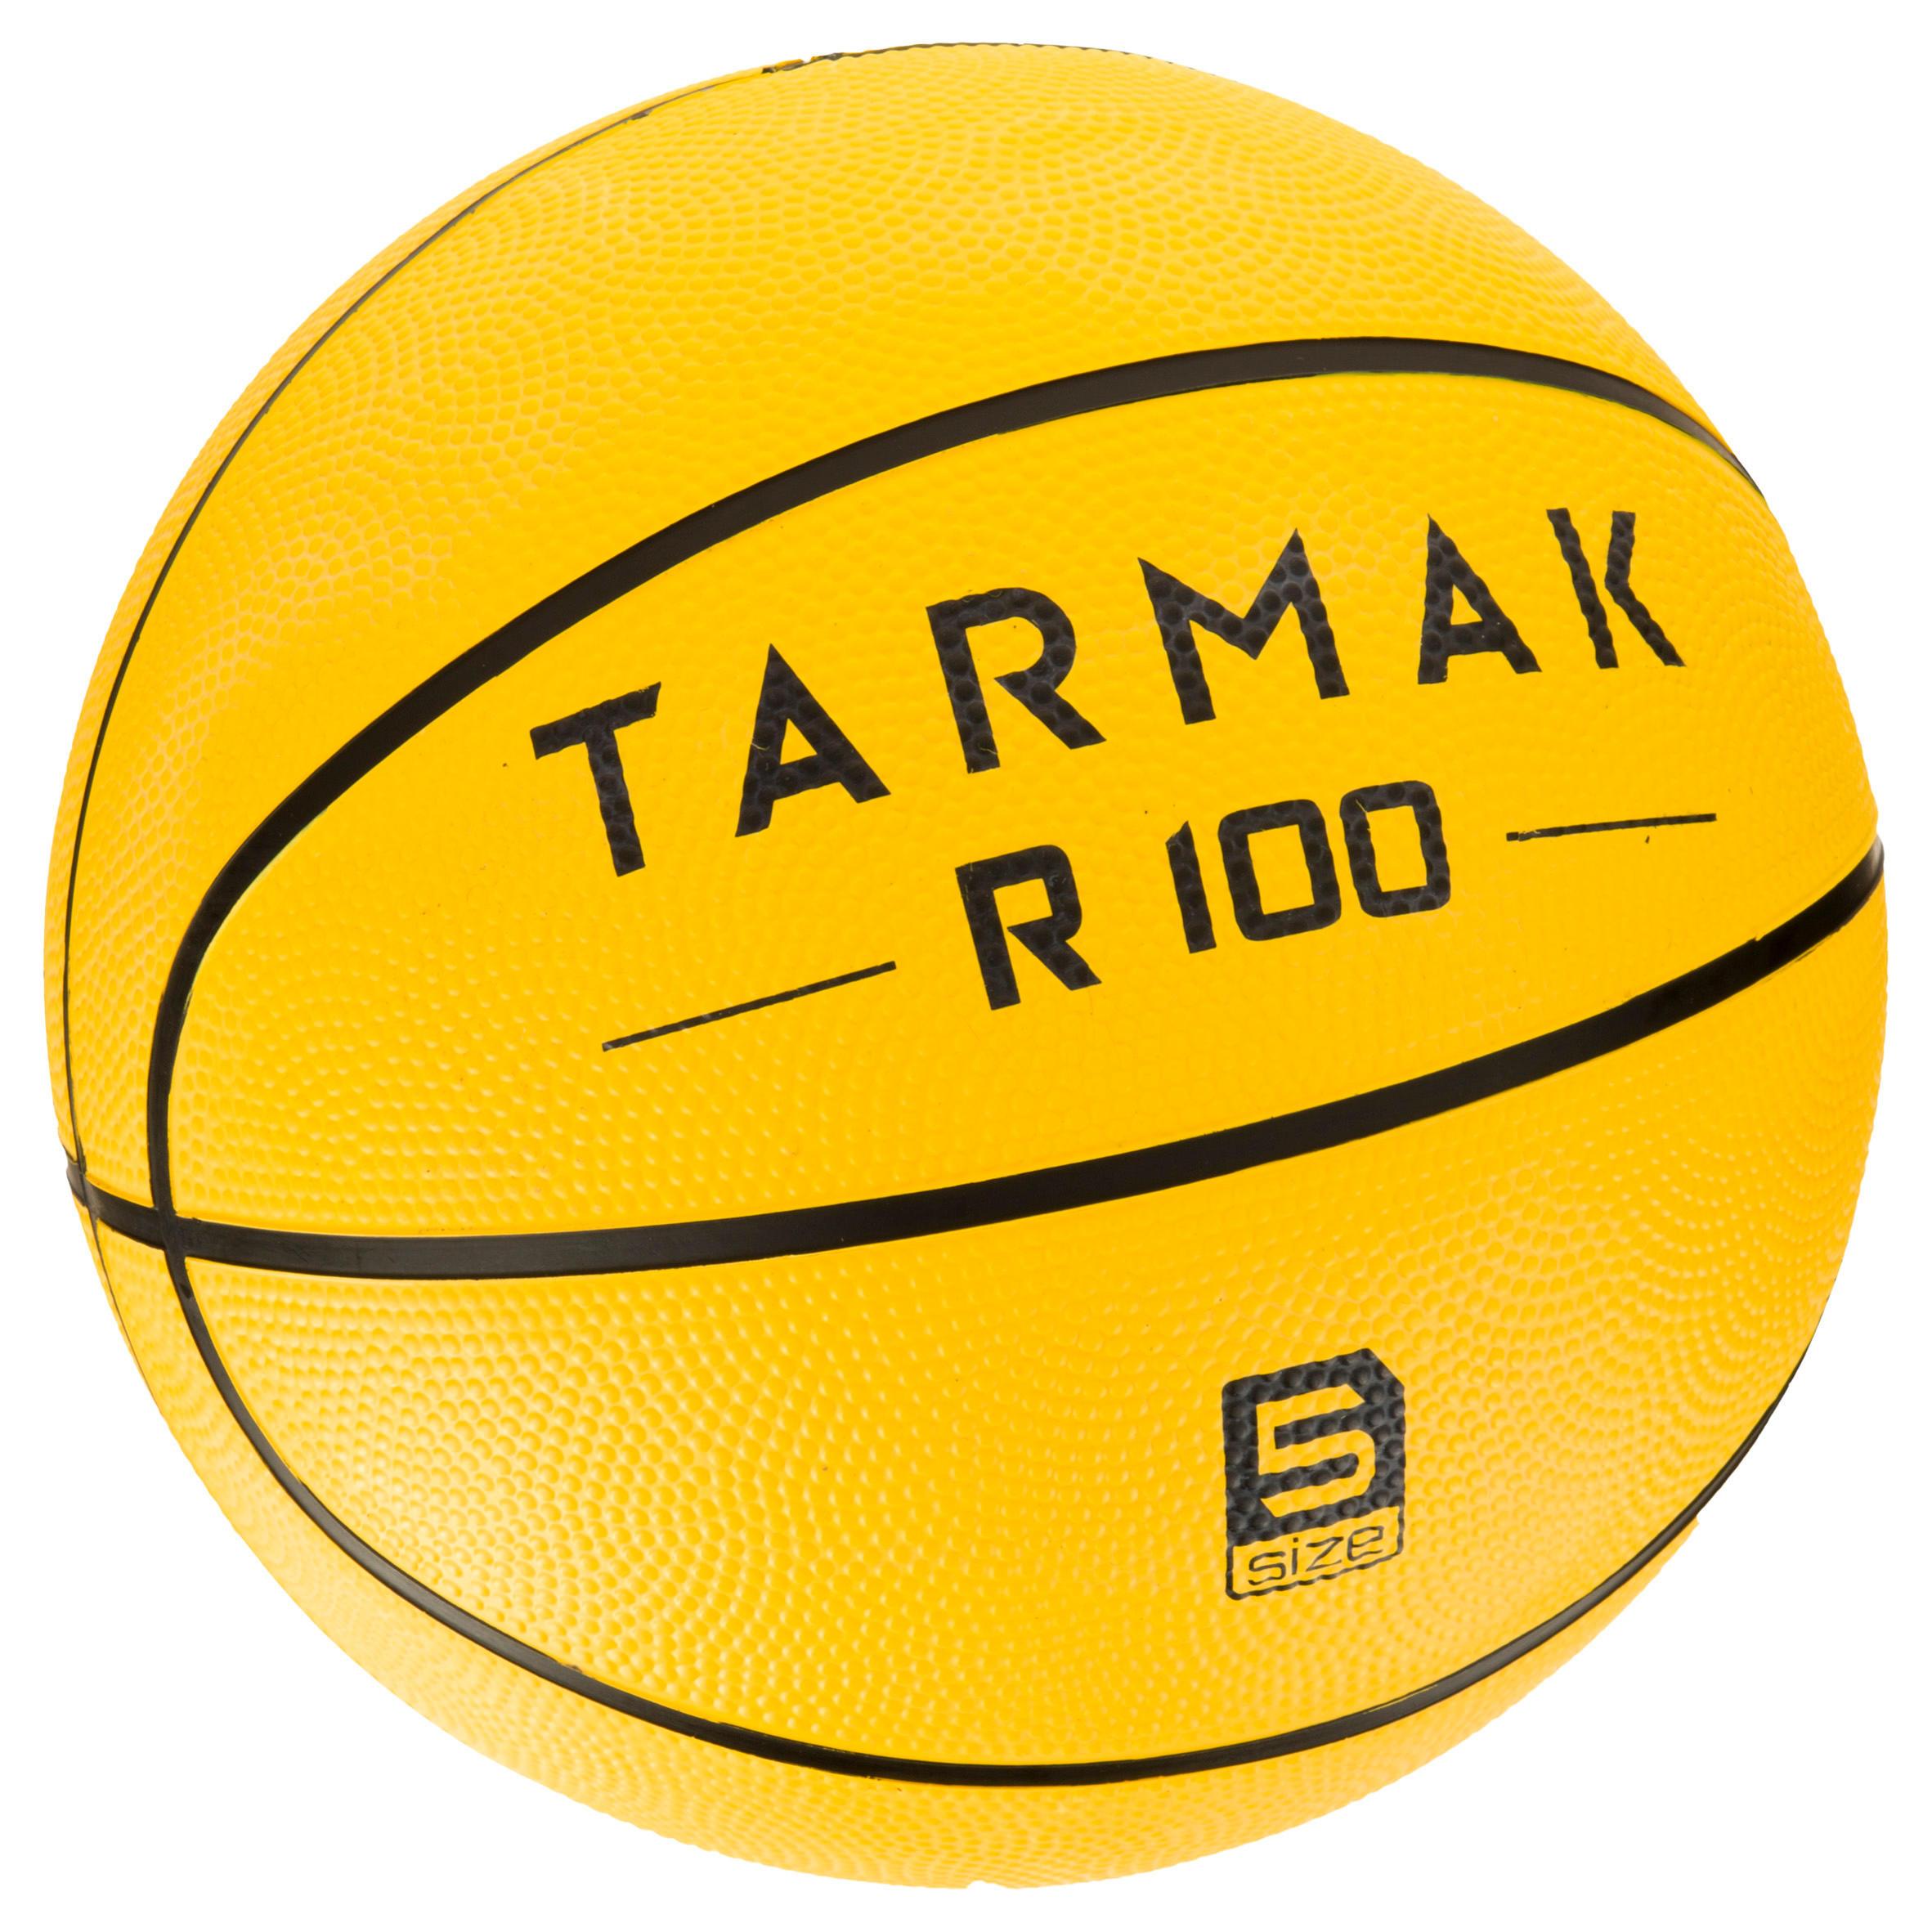 R100 Kids'/Adult Size 5/7 Beginner Basketball - Yellow